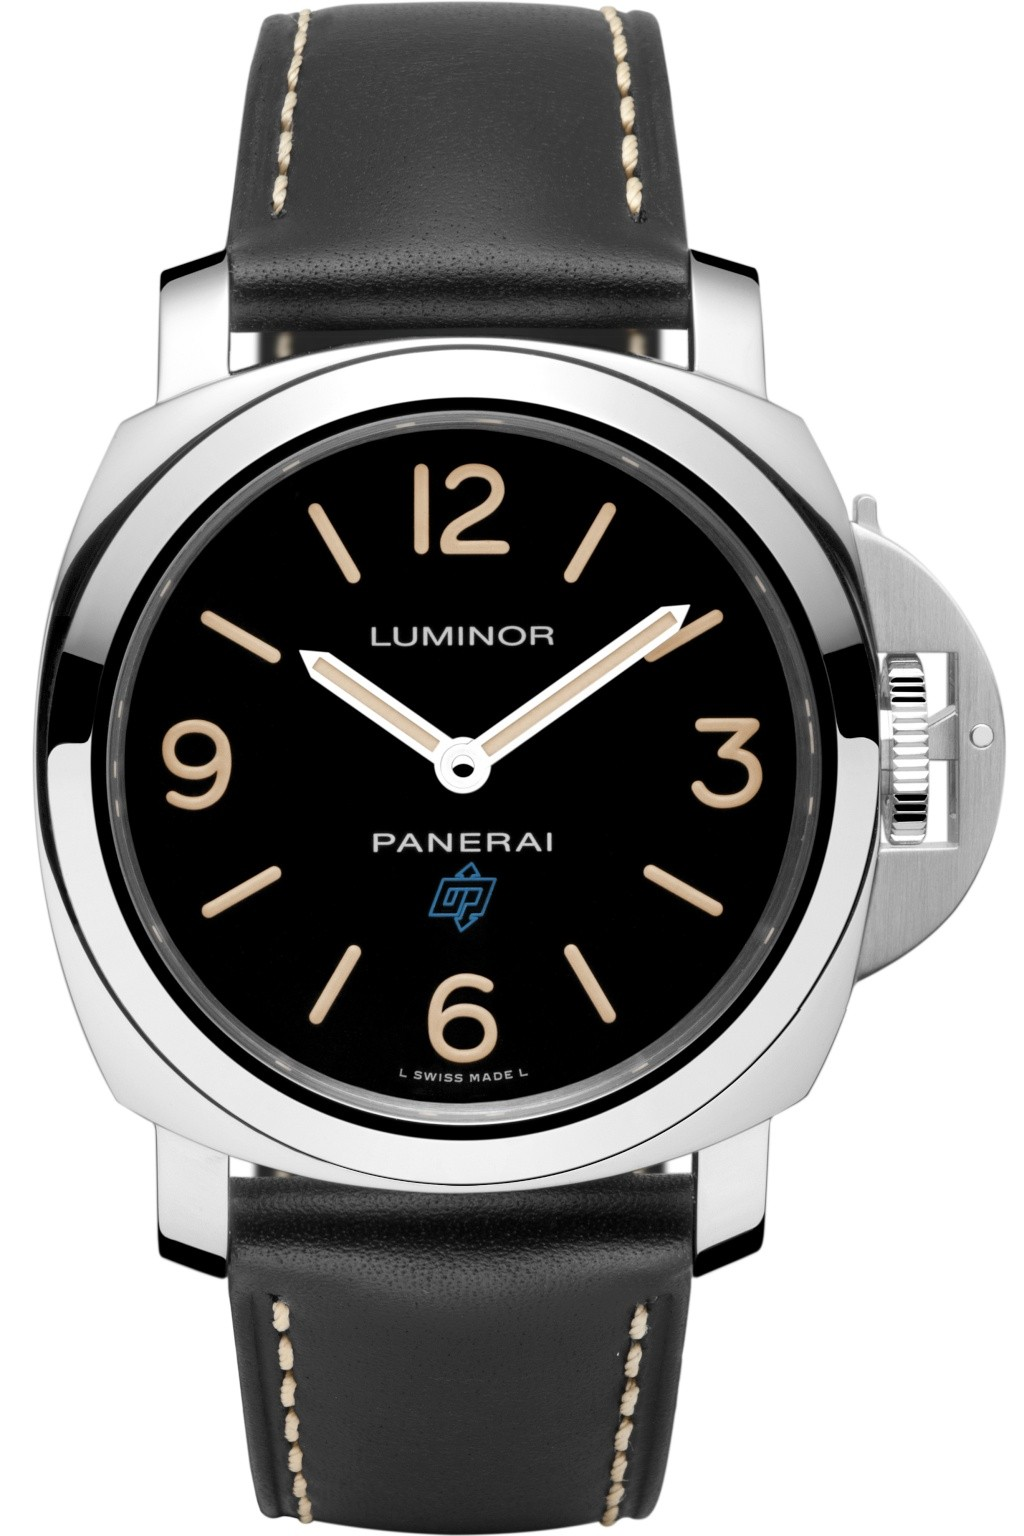 Communiqué de Presse : LUMINOR BASE LOGO ACIER -15th Anniversary Paneristi.com– 44mm - PAM00634 Pam63410